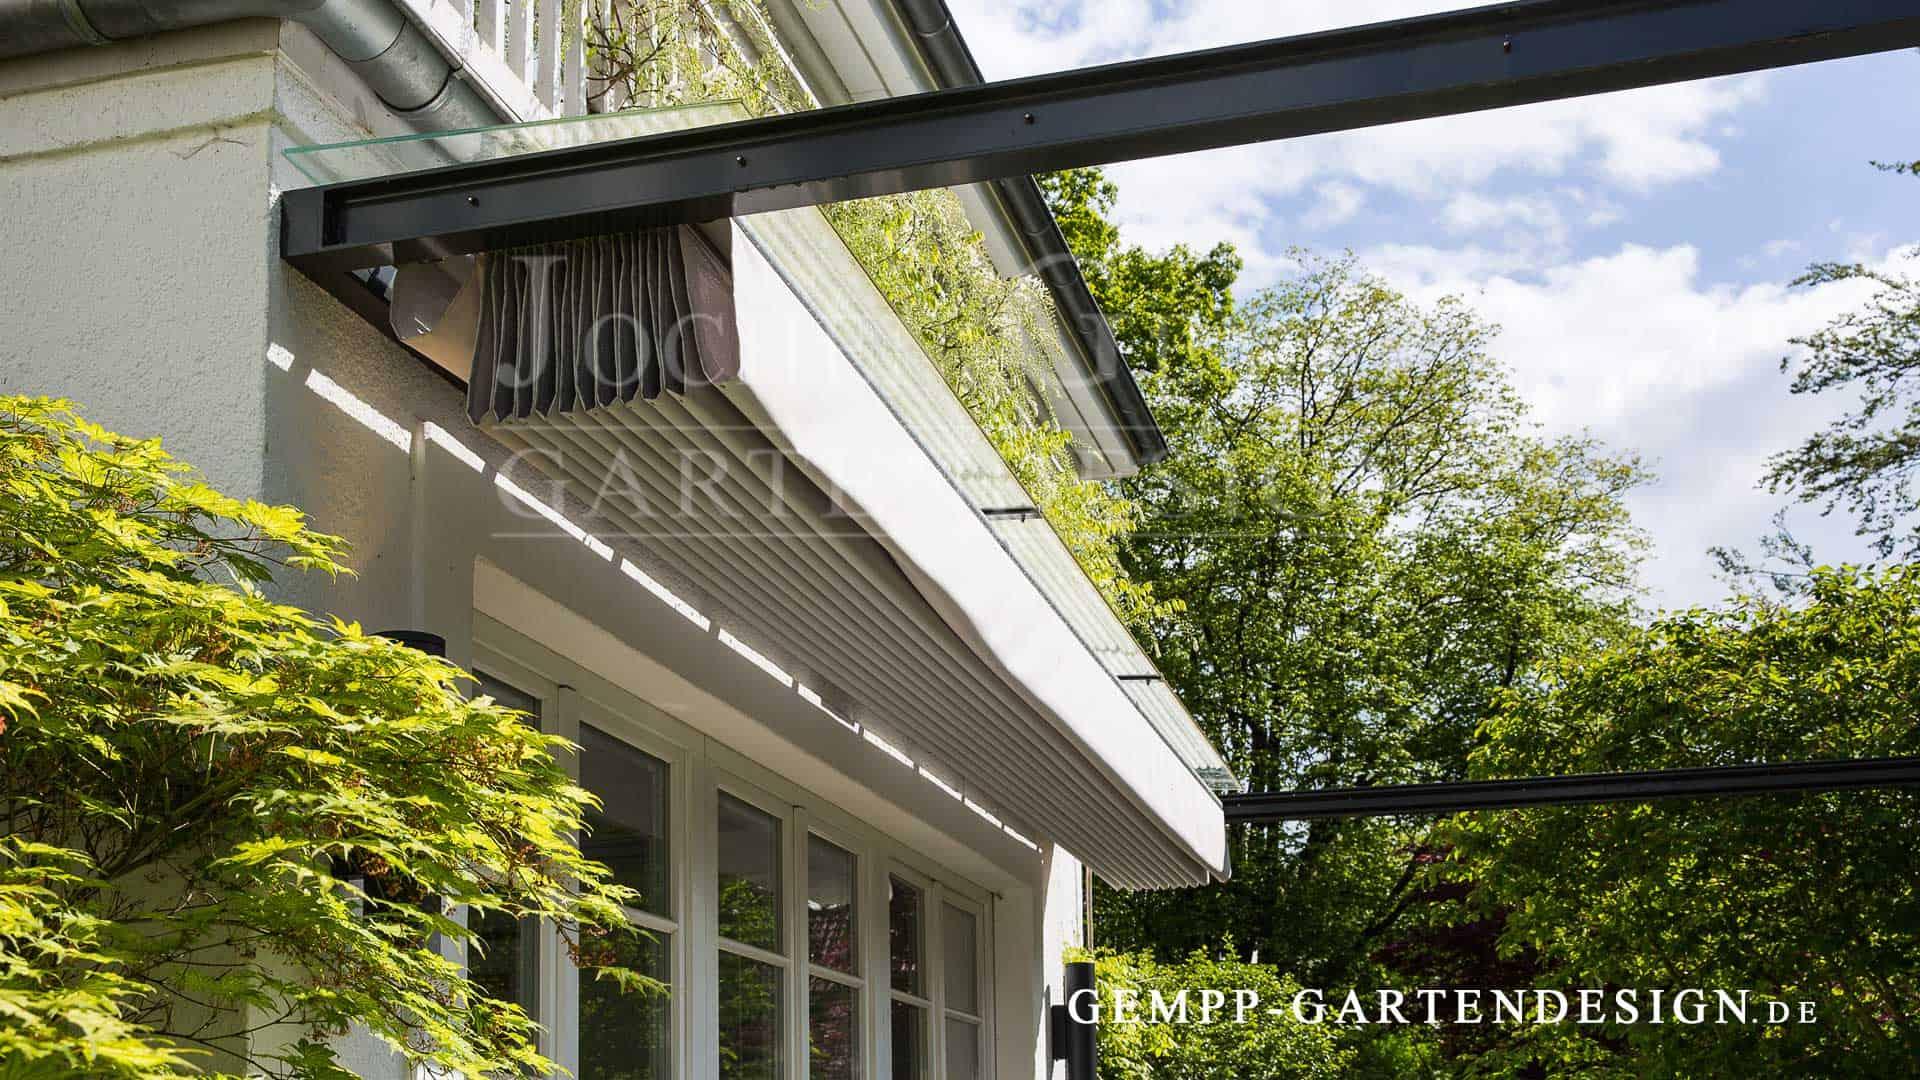 Terrassenuberdachung Gempp Gartendesign